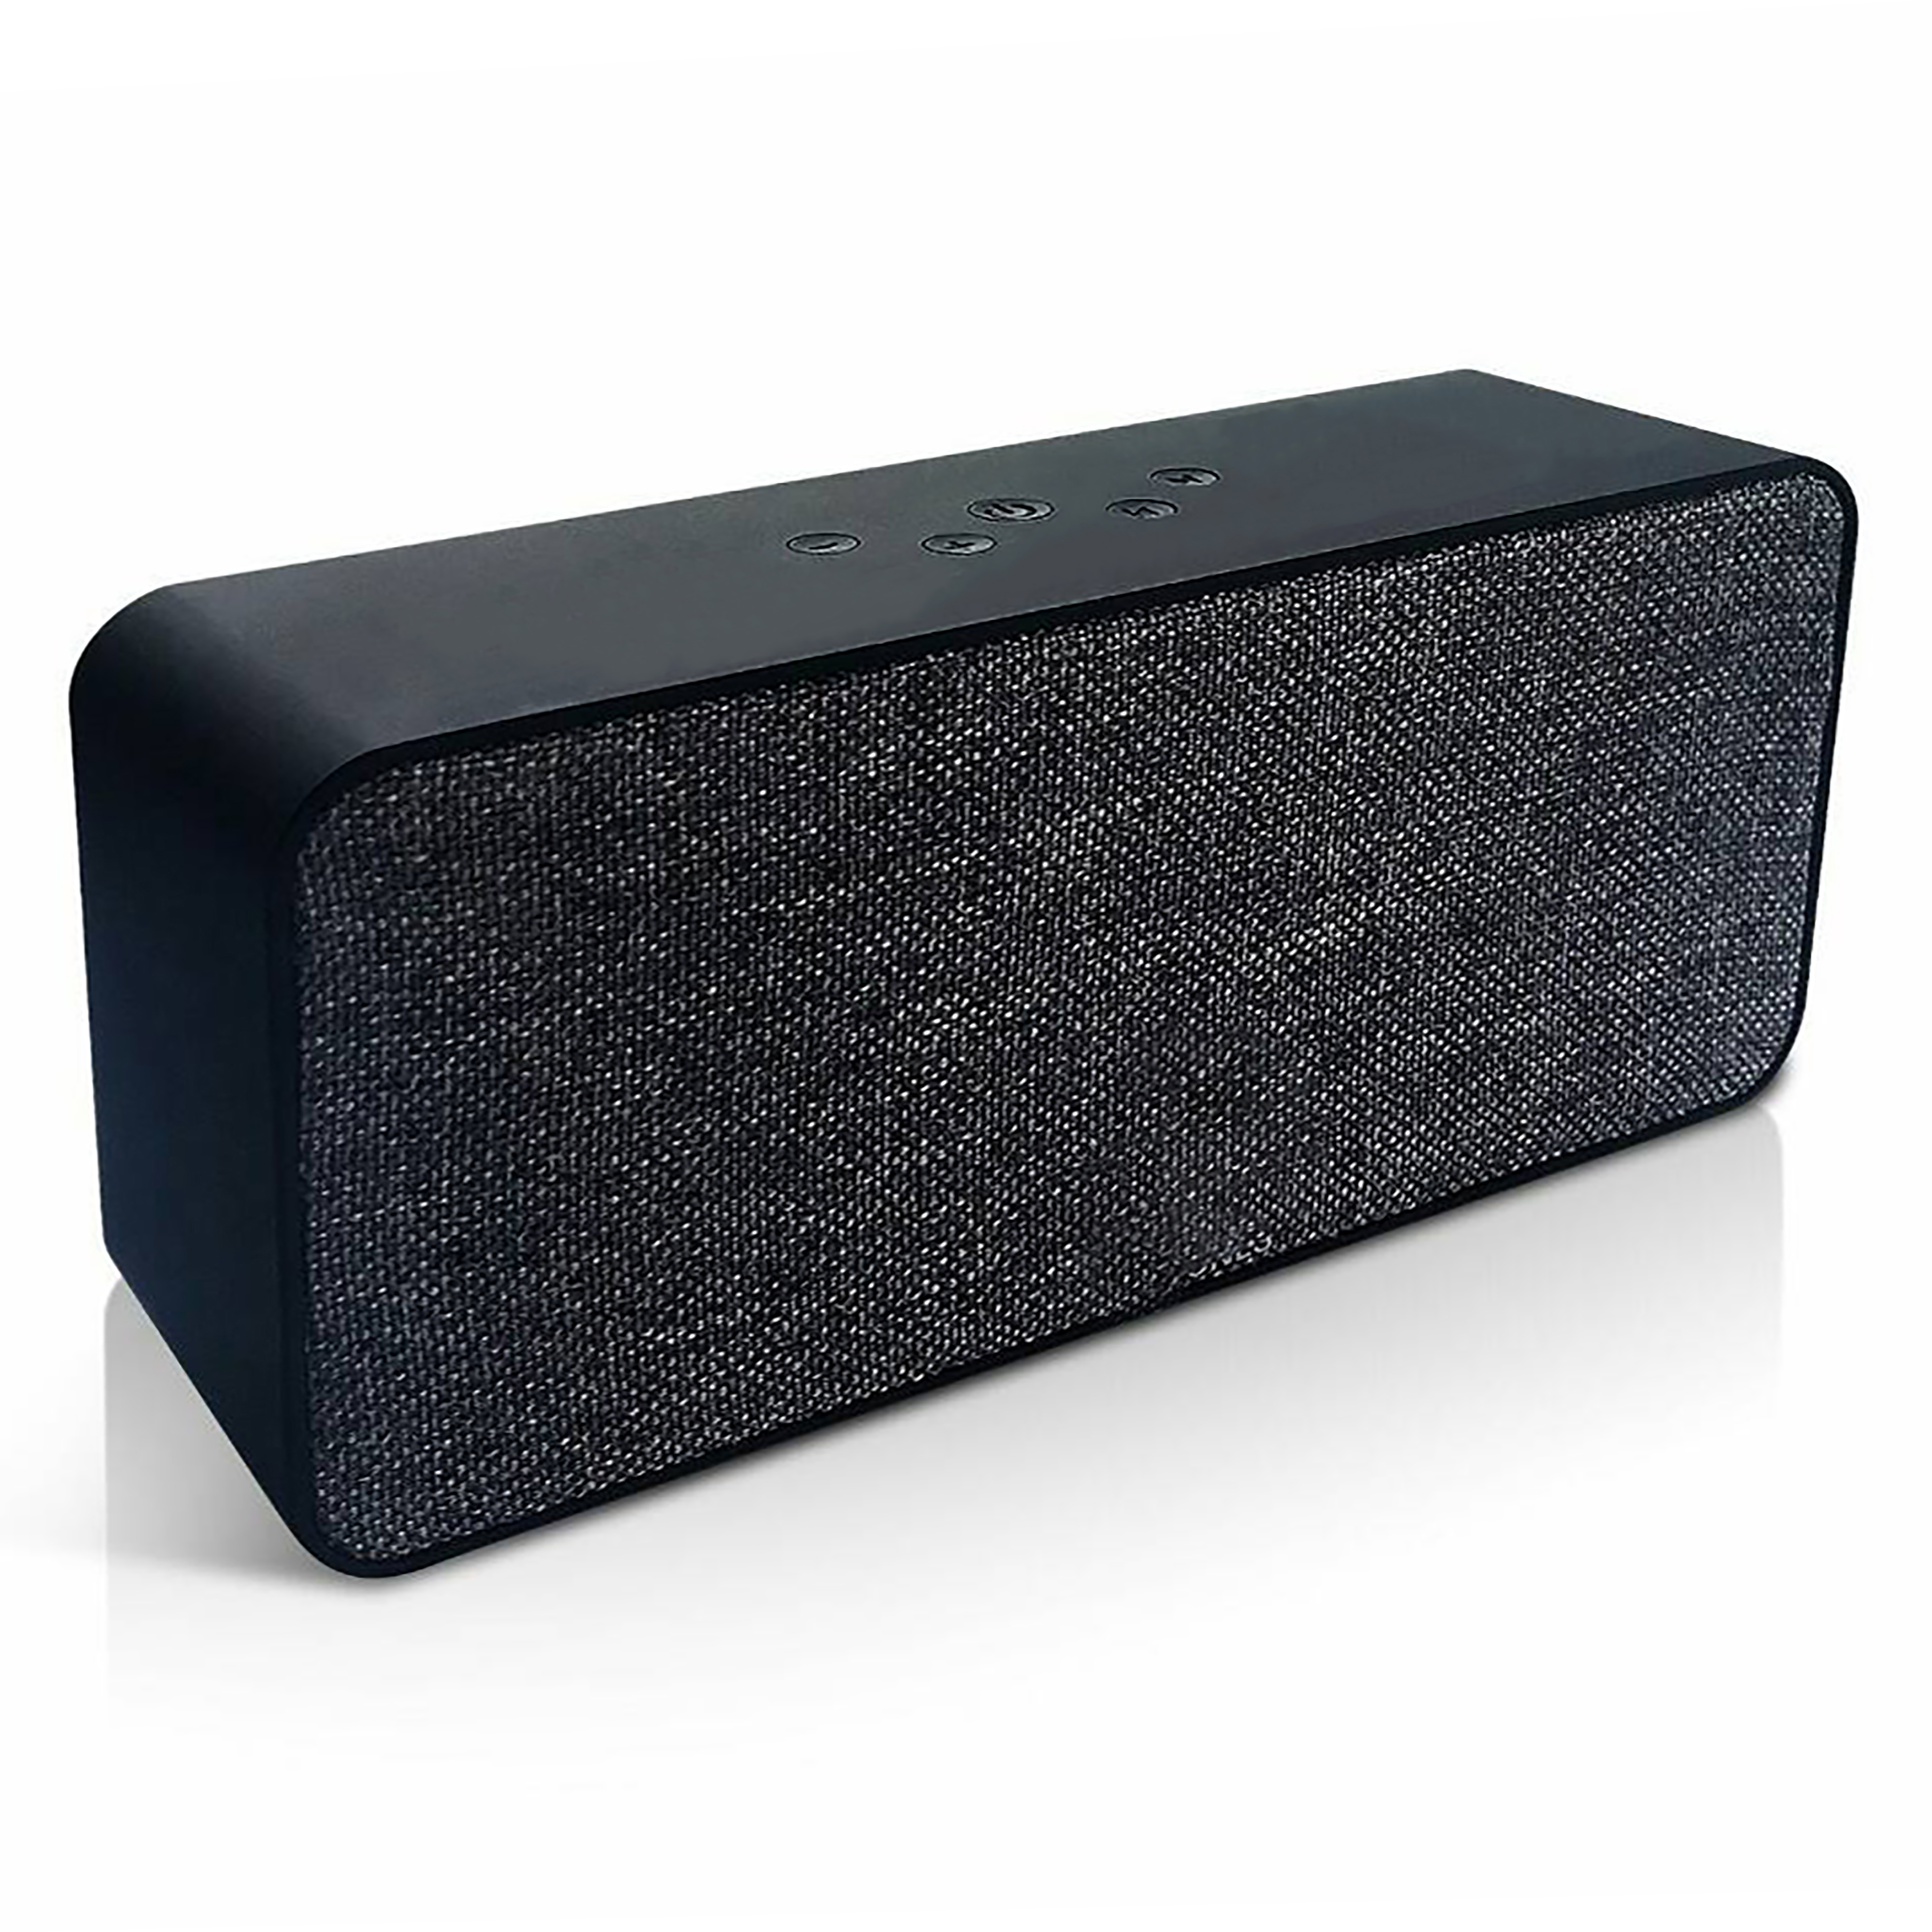 TechComm TB-BV6 Wireless Portable Bluetooth Speaker